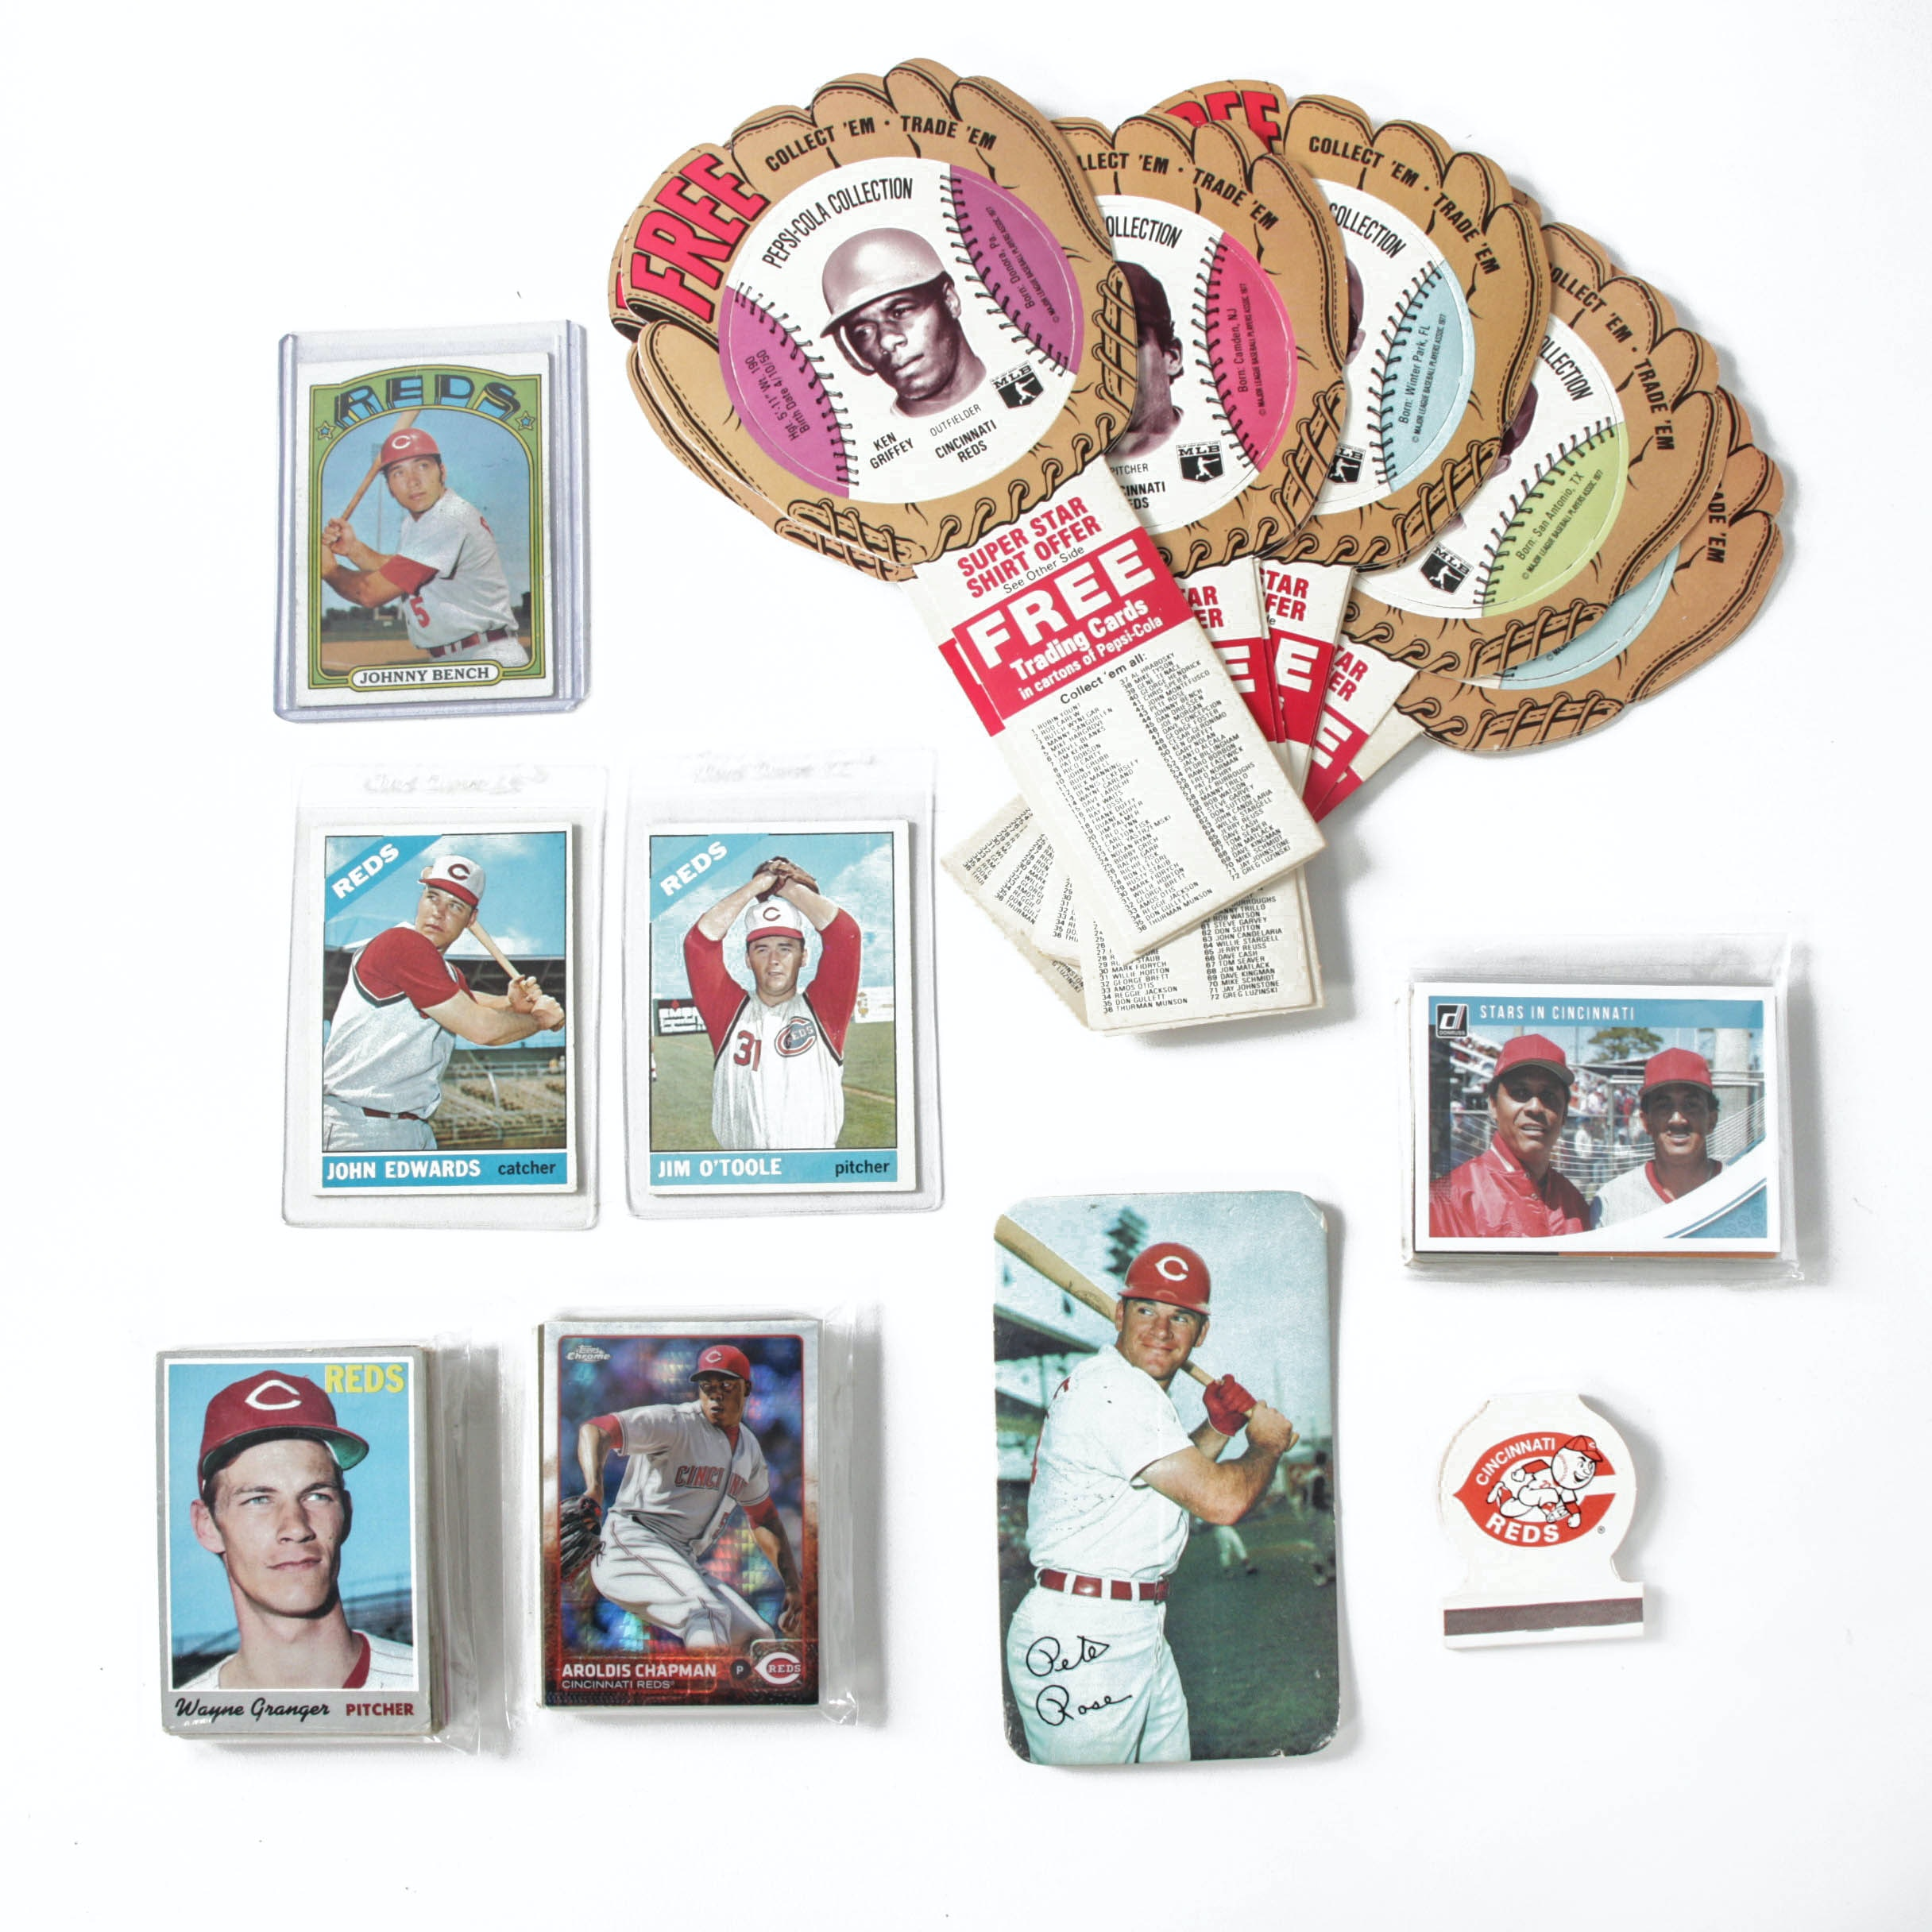 Cincinnati Reds Baseball Cards and Collectibles